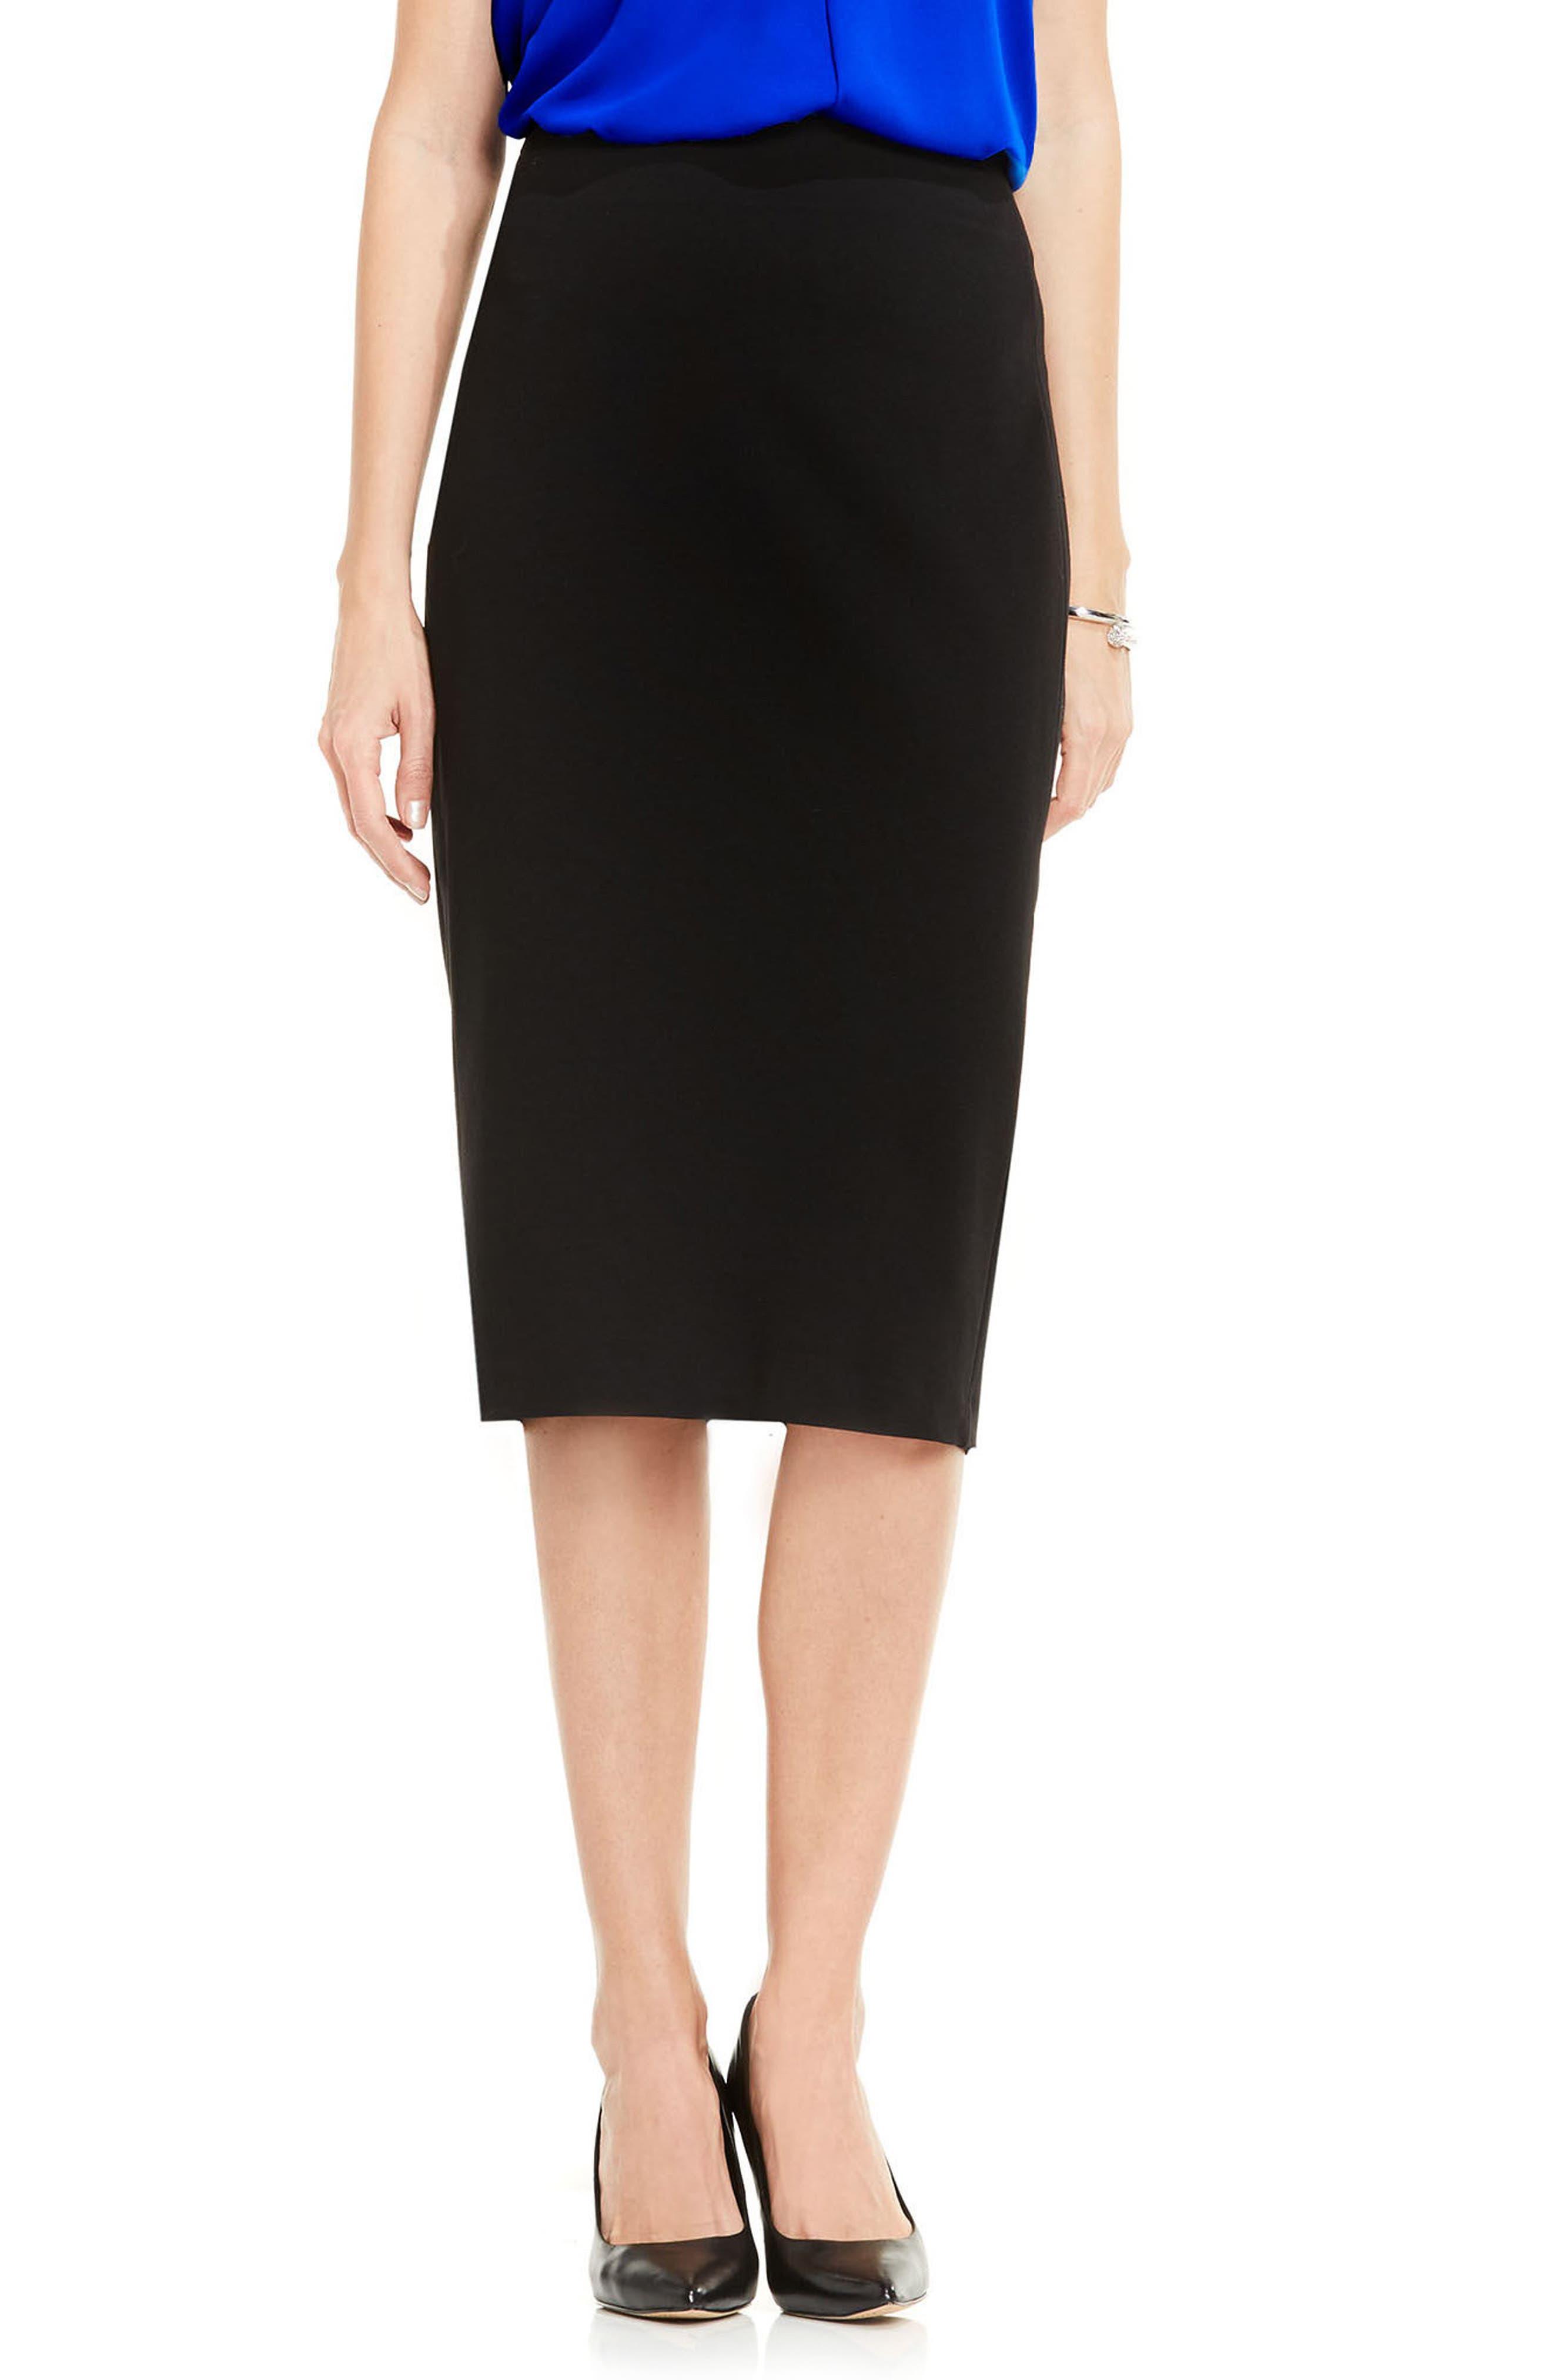 Alternate Image 1 Selected - Vince Camuto Pull-On Pencil Skirt (Regular & Petite)